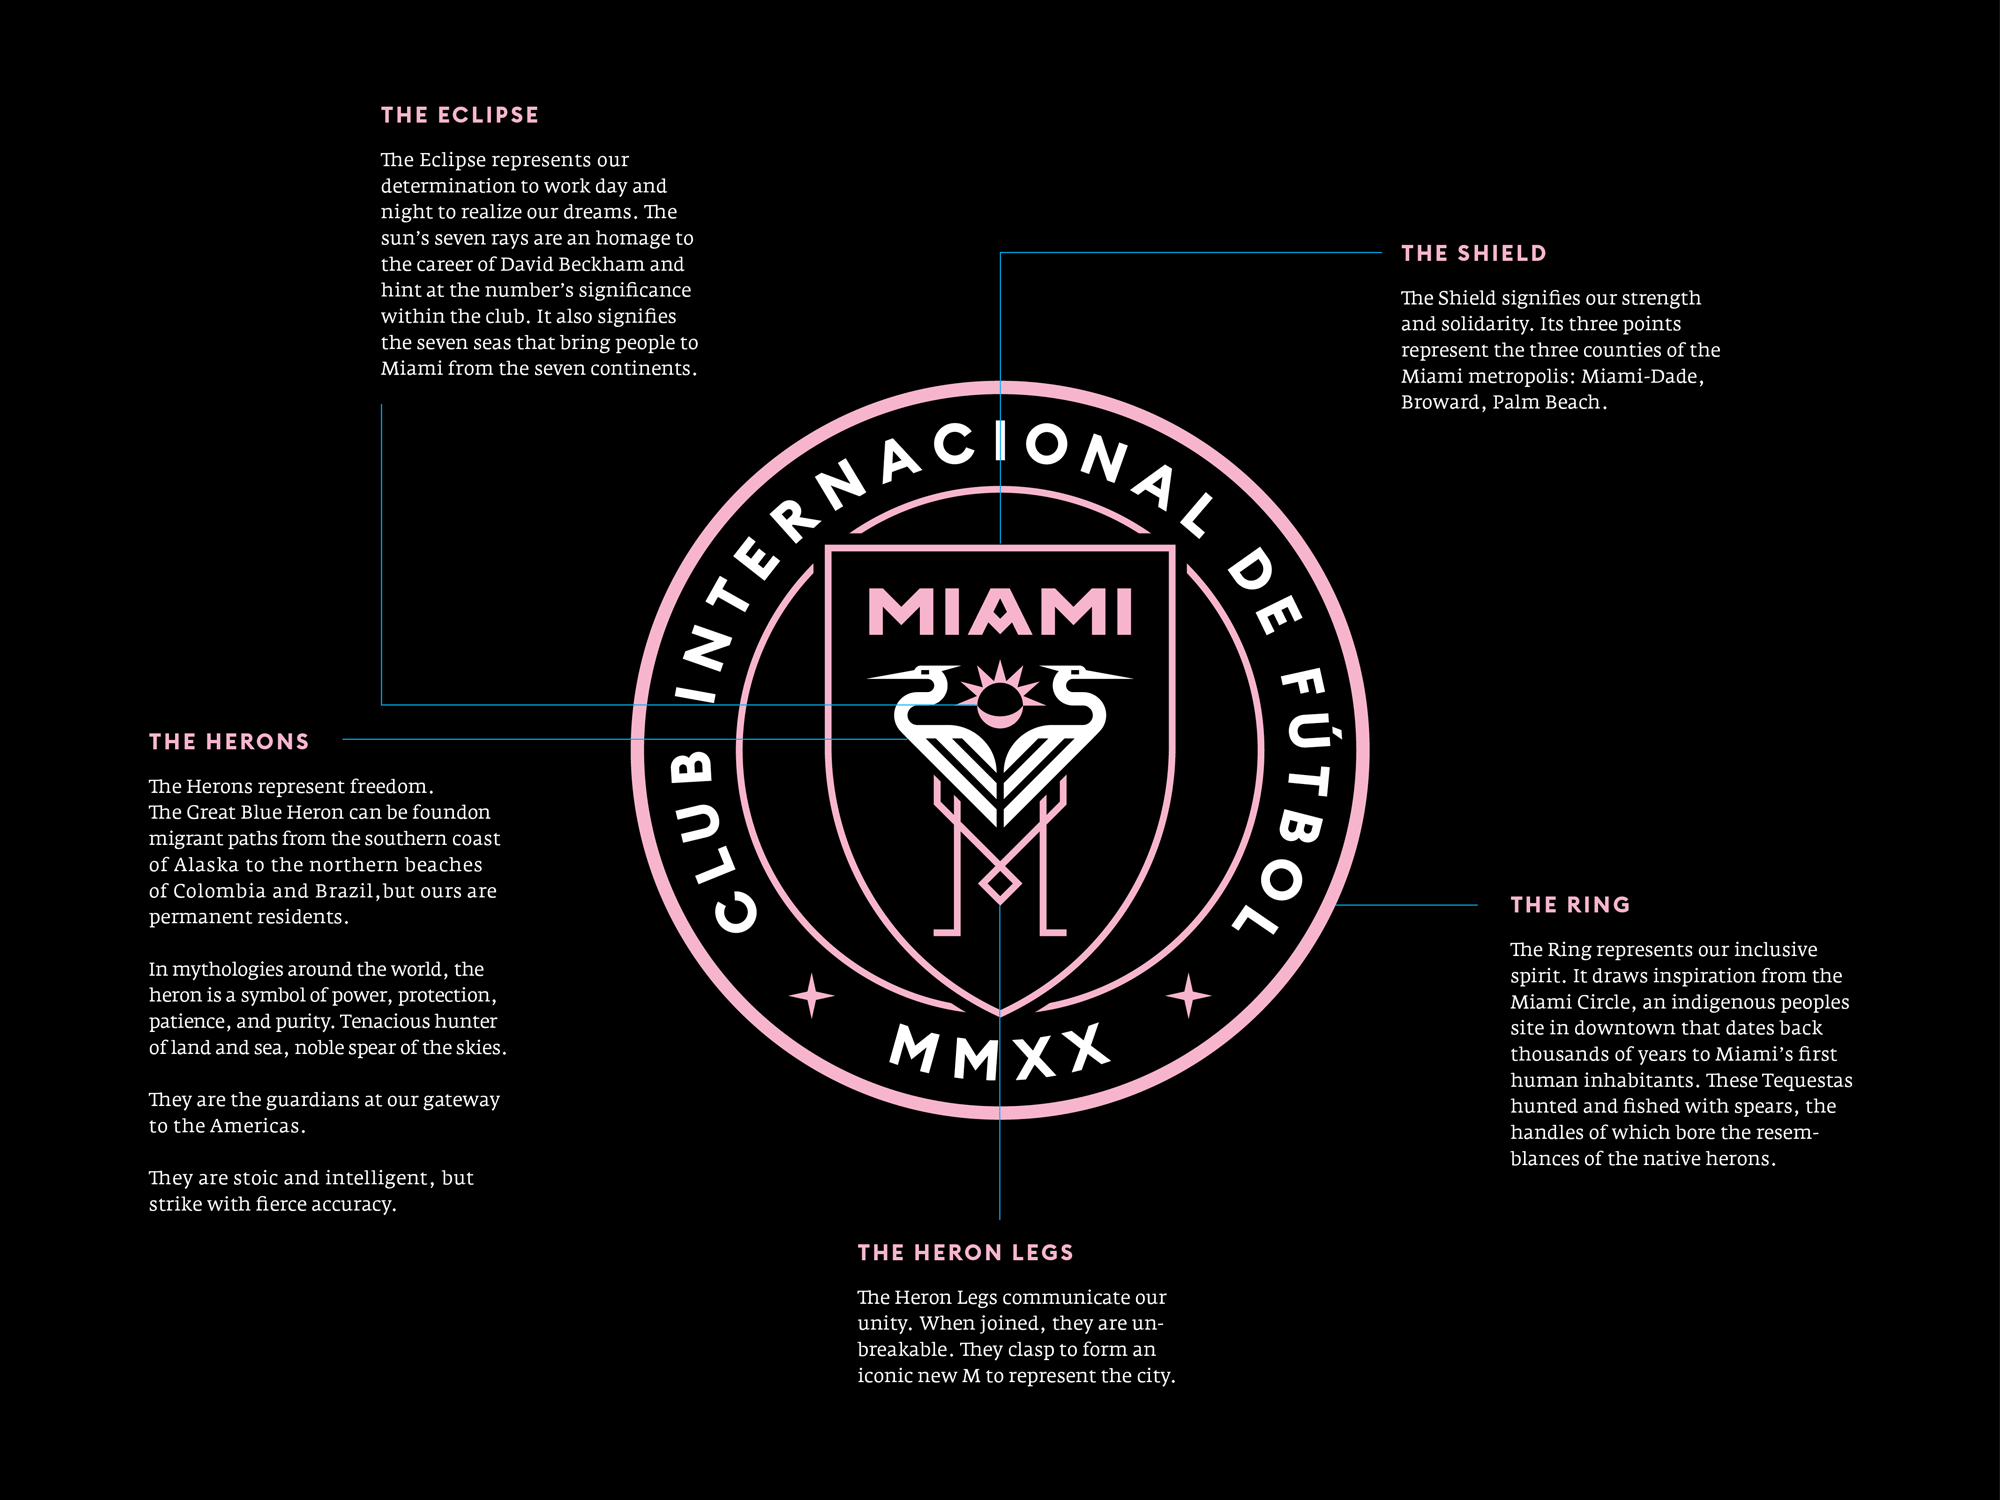 b9fe76b9c69 New Logo for Club Internacional de Fútbol Miami by Doubleday   Cartwright